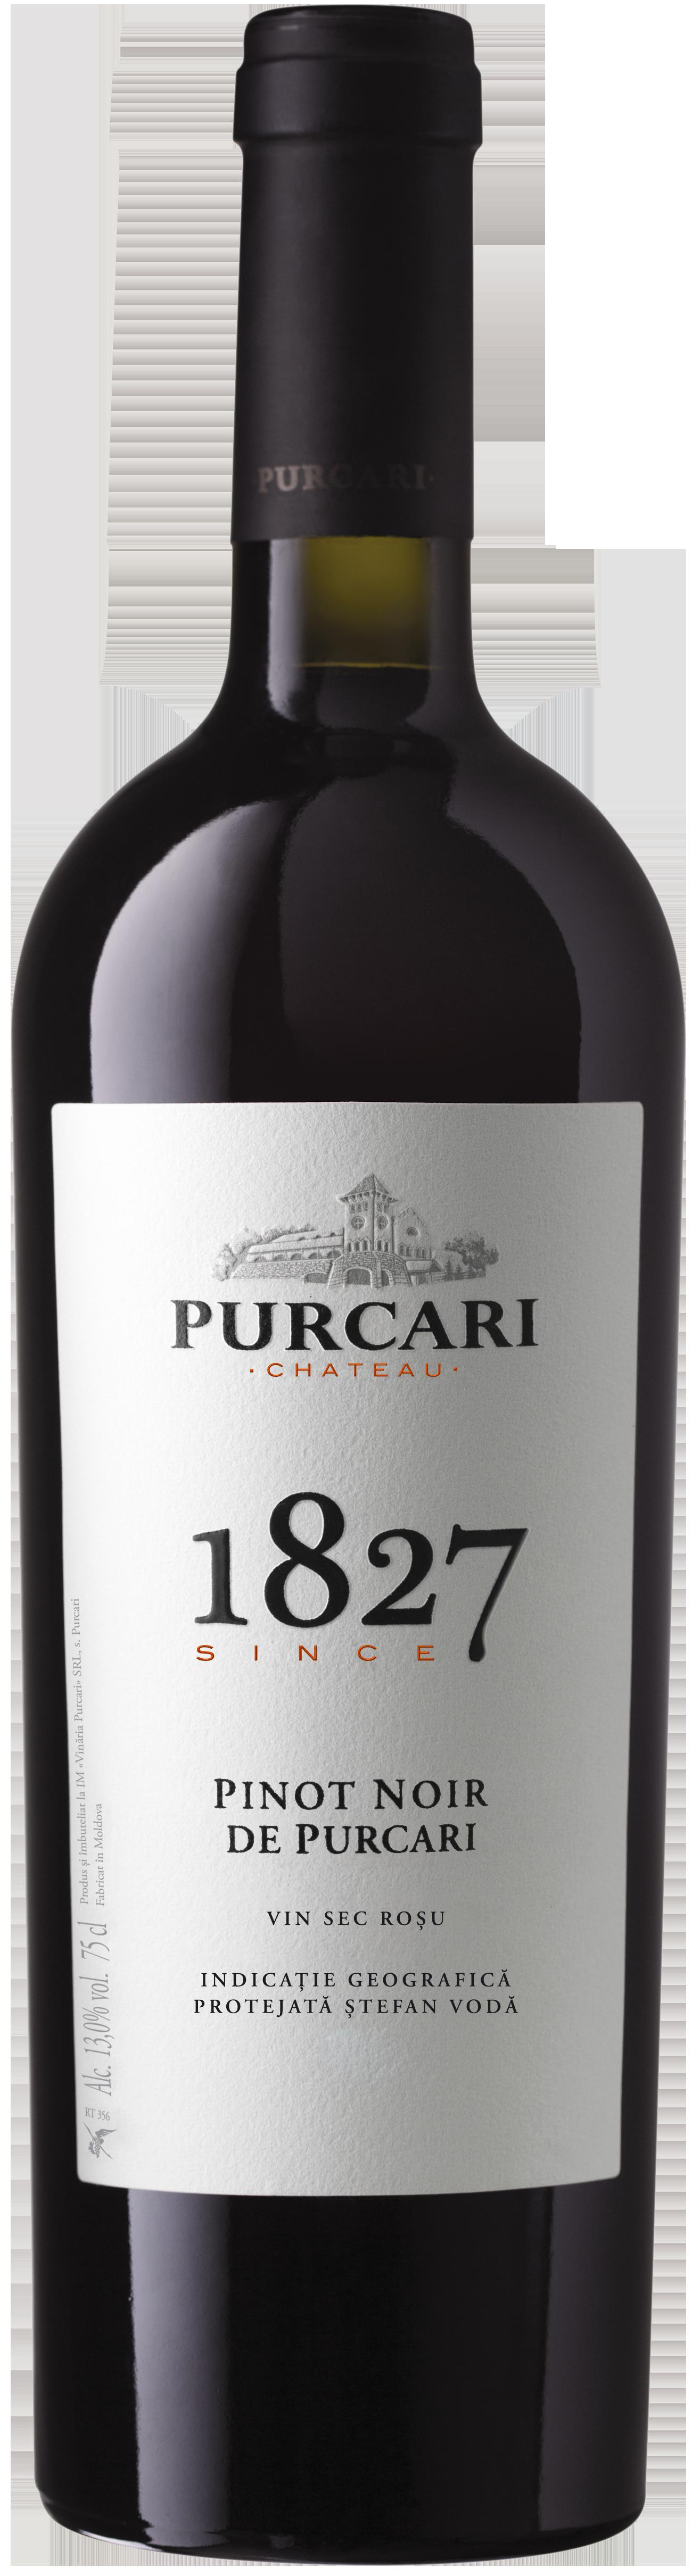 Chateau Purcari Pinot Noir - Moldova